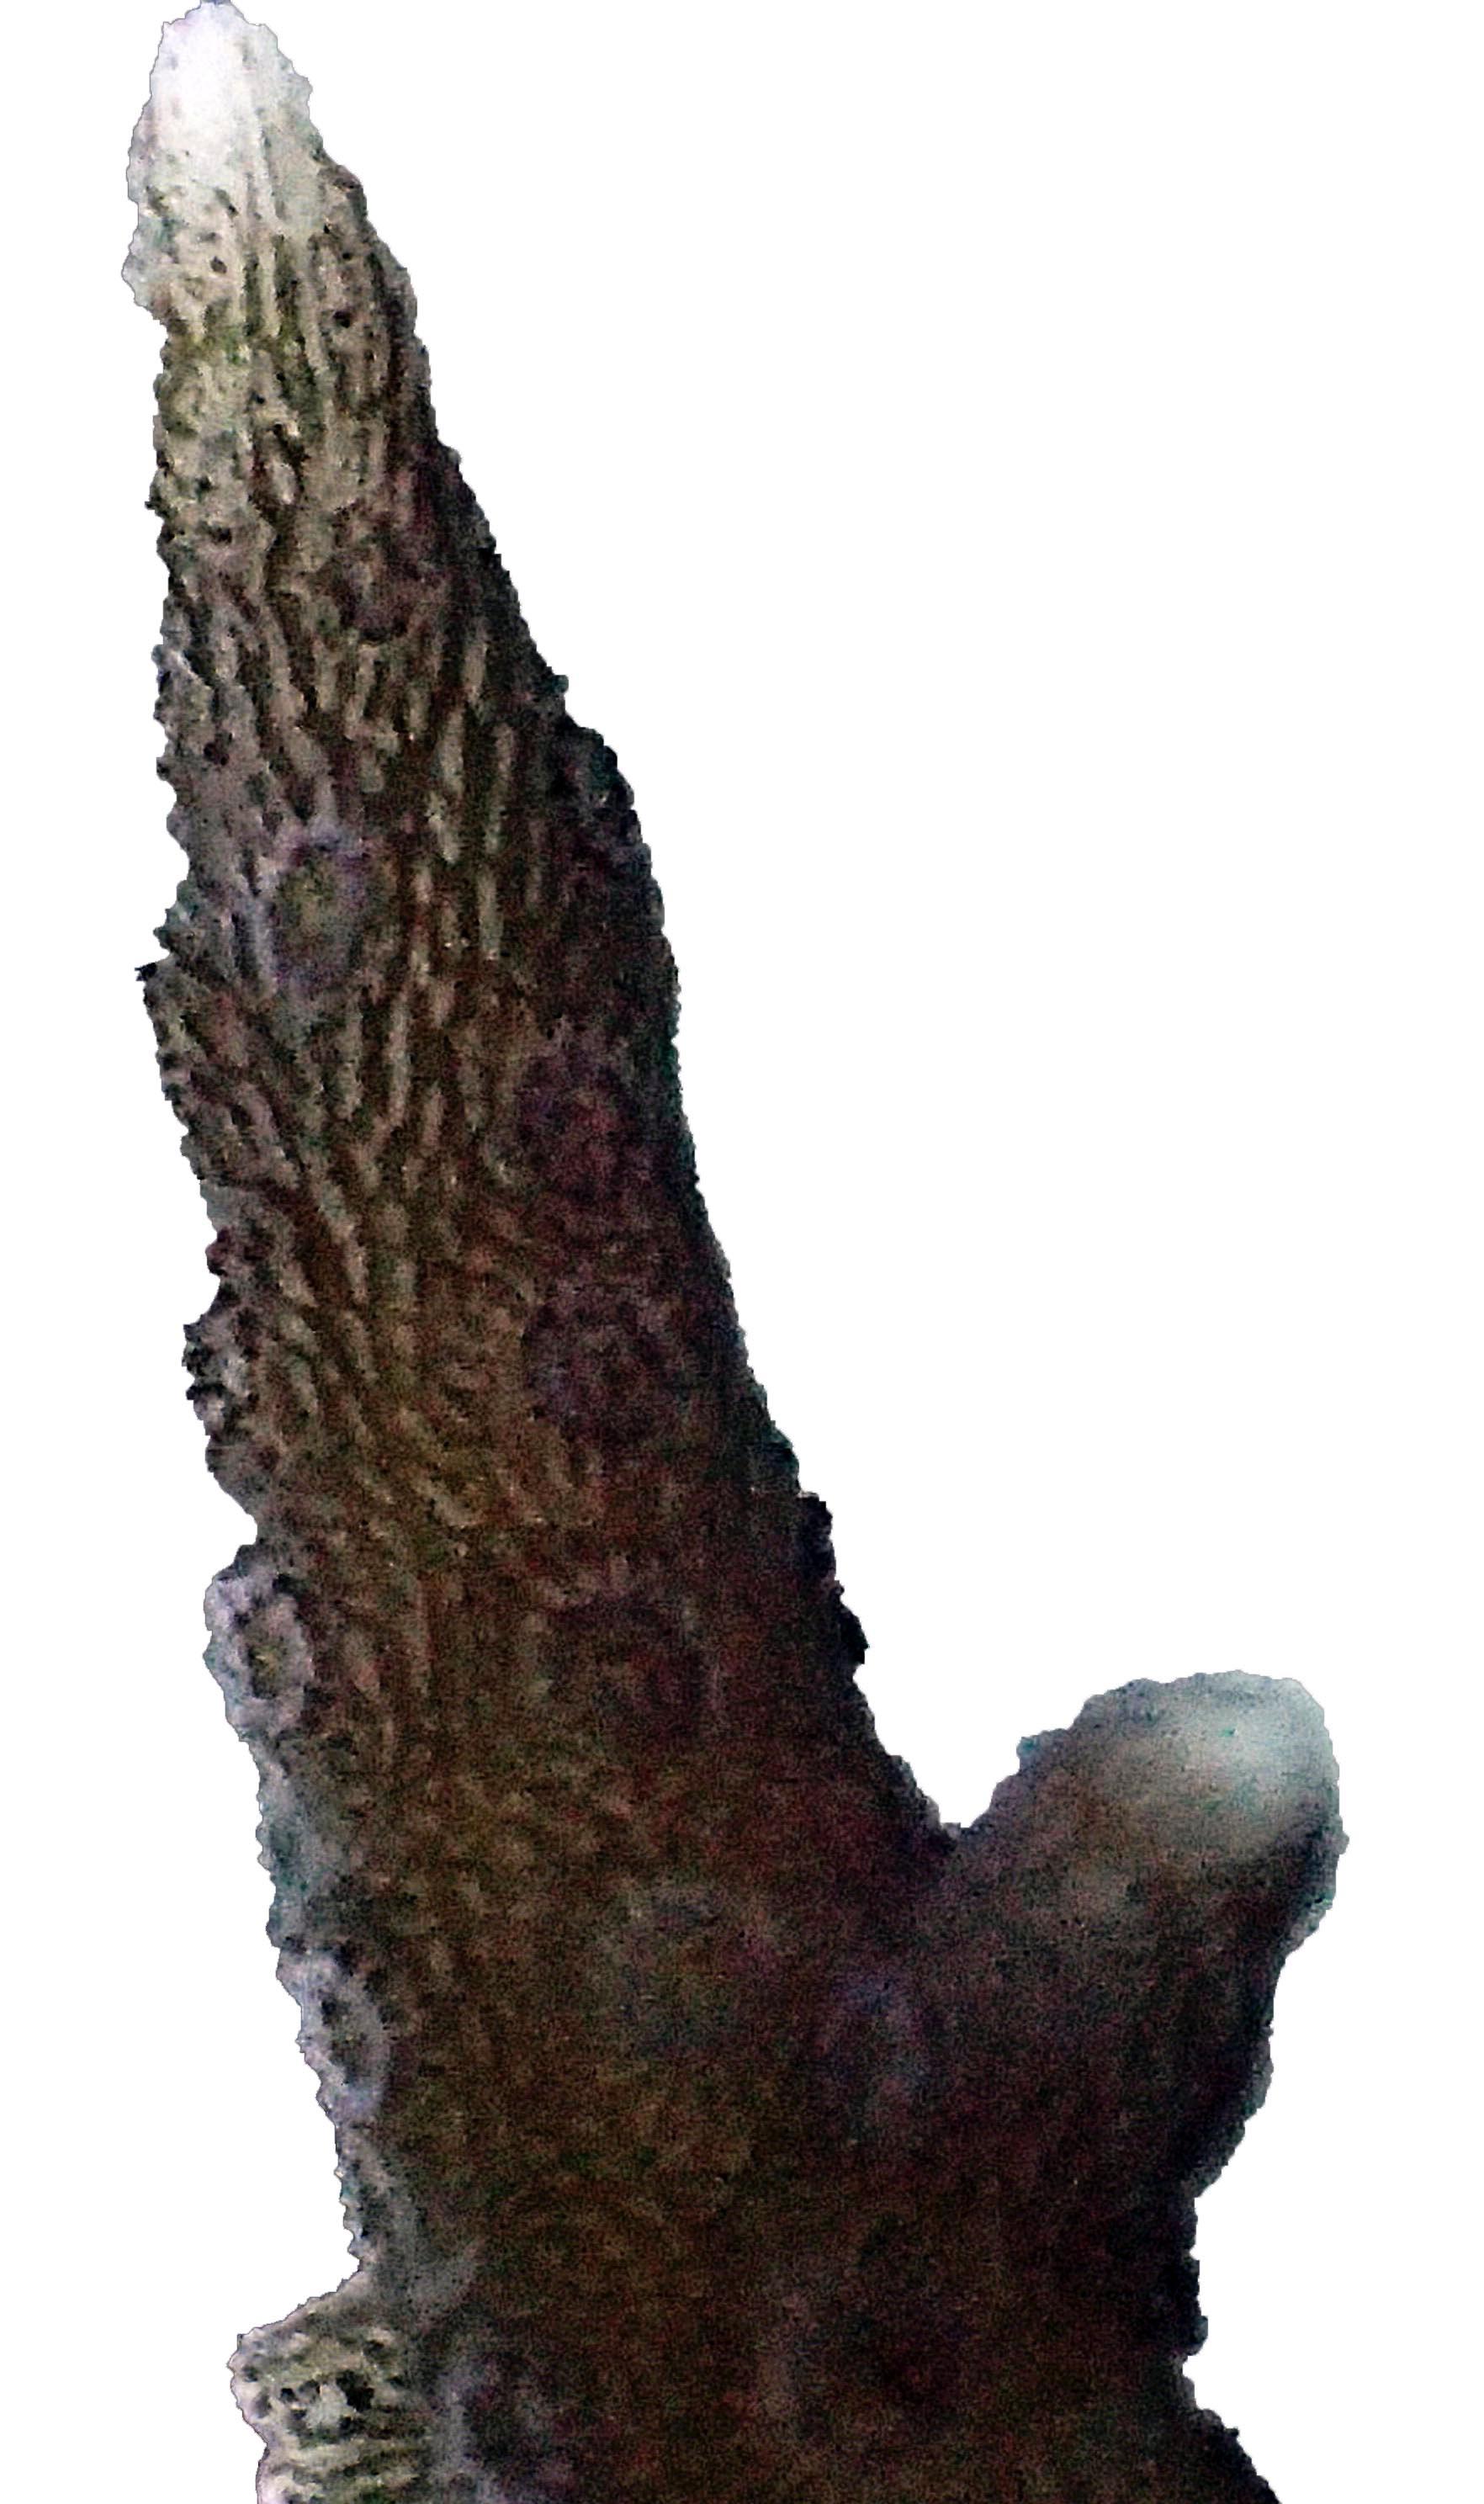 P1171731.jpg